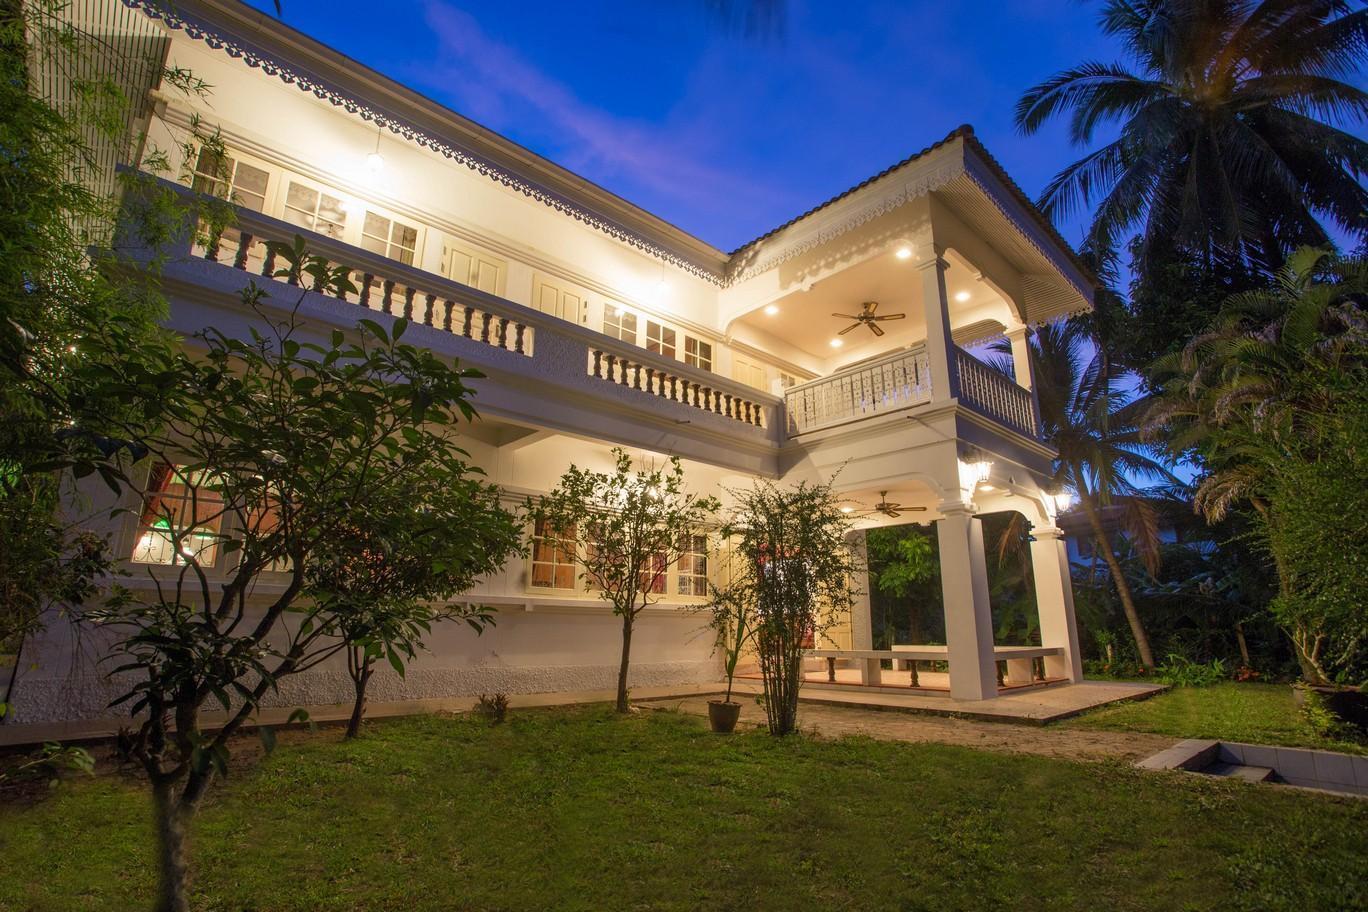 Beautiful 4 bed villa short walk from the beach วิลลา 4 ห้องนอน 3 ห้องน้ำส่วนตัว ขนาด 286 ตร.ม. – แม่น้ำ